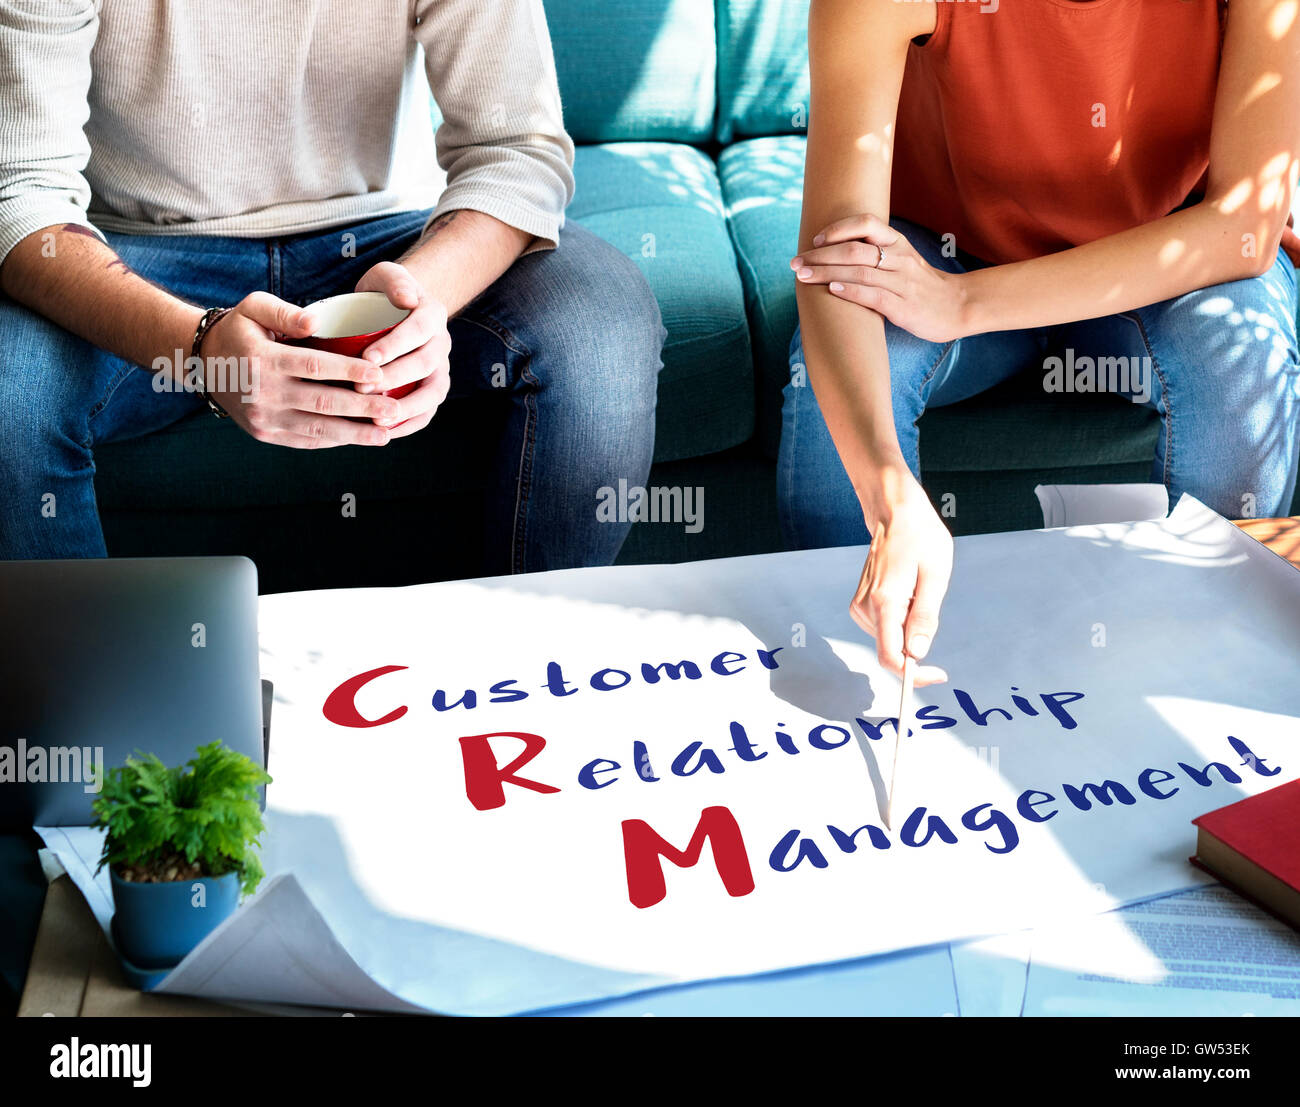 Business Customer Relationship Management Concept - Stock Image